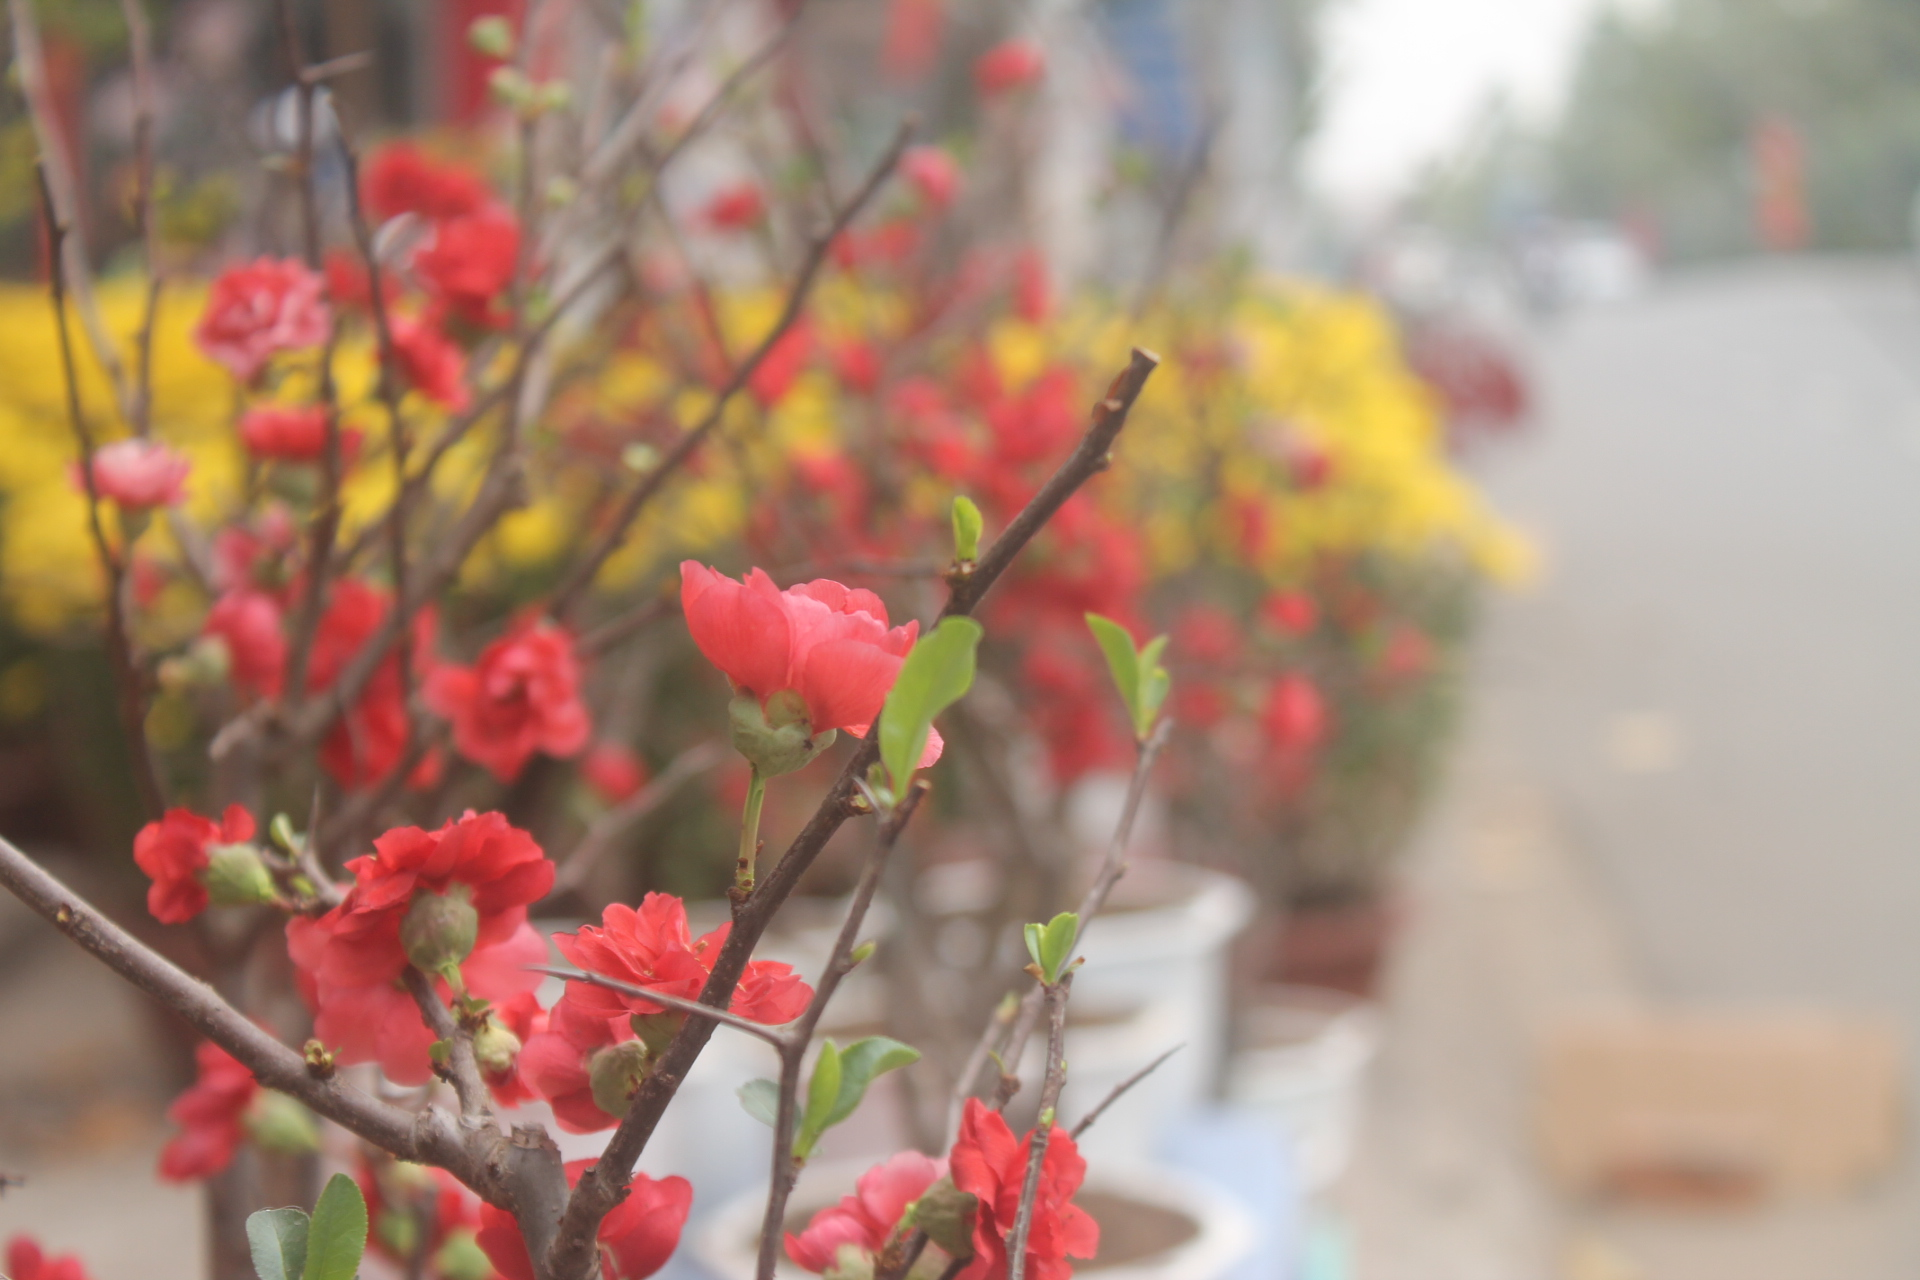 Ảnh hoa mai đỏ đẹp nhất